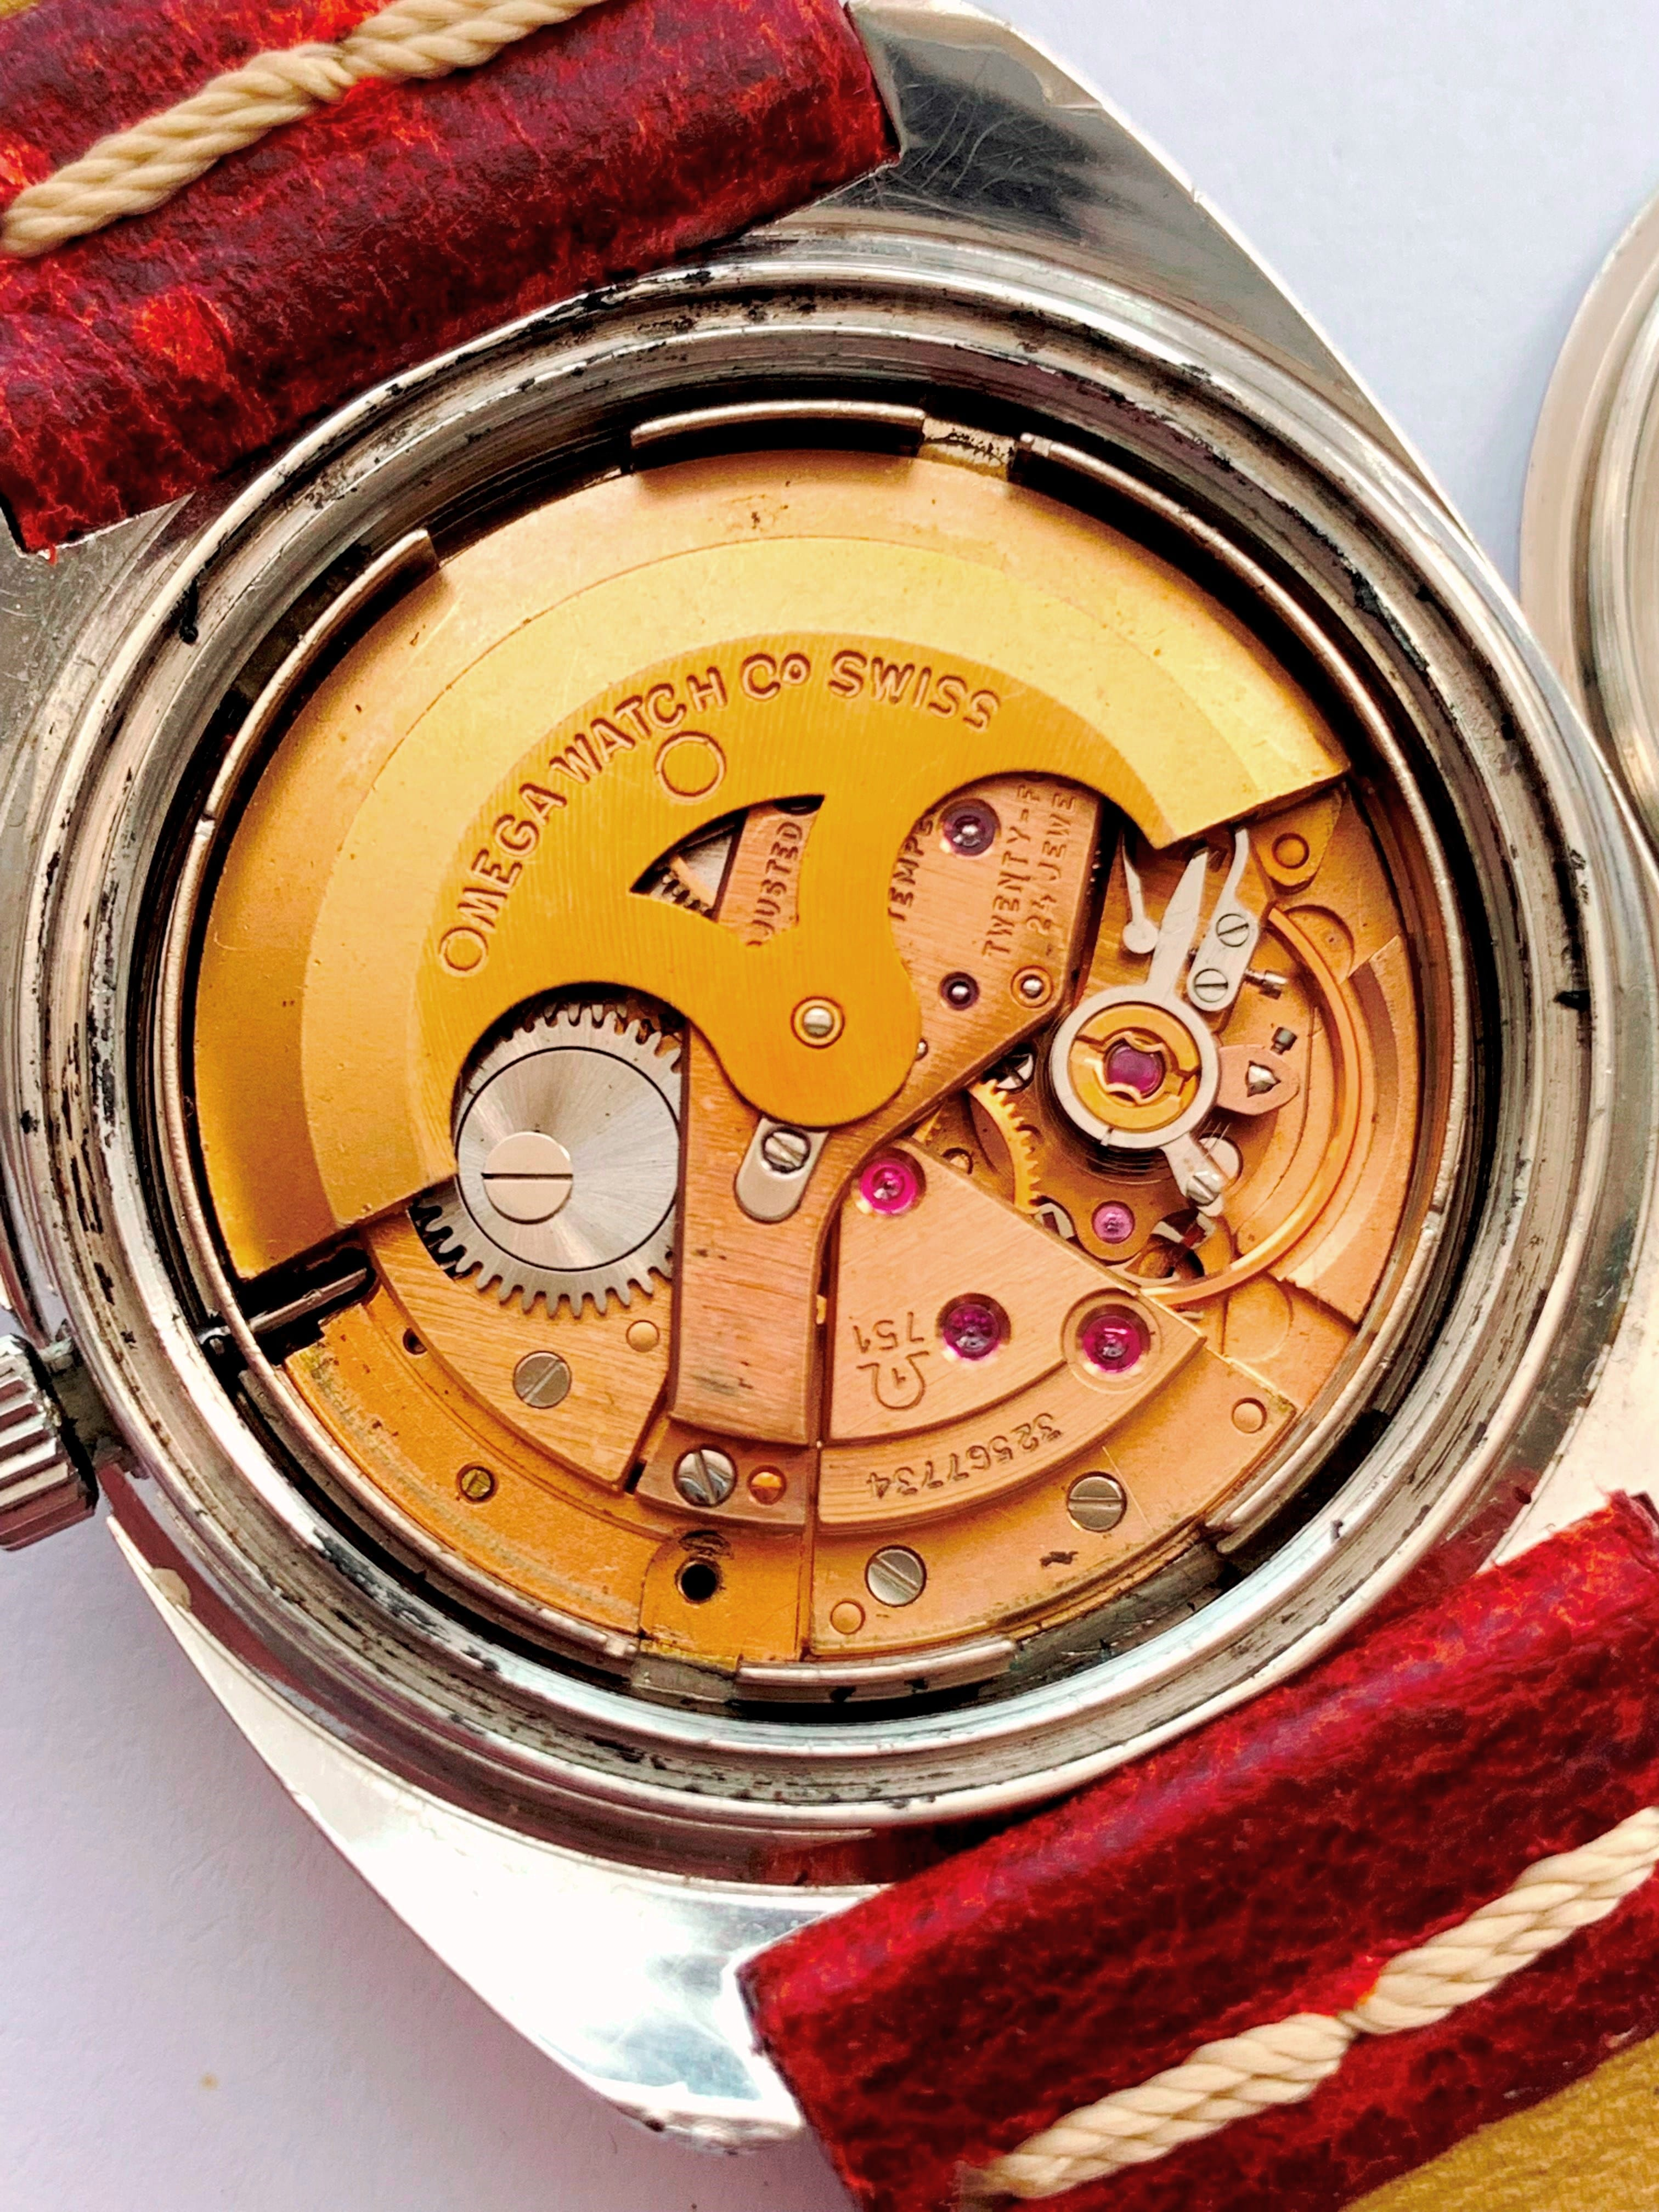 Vintage Omega Seamaster Day Date Automatic Chronometer RARE